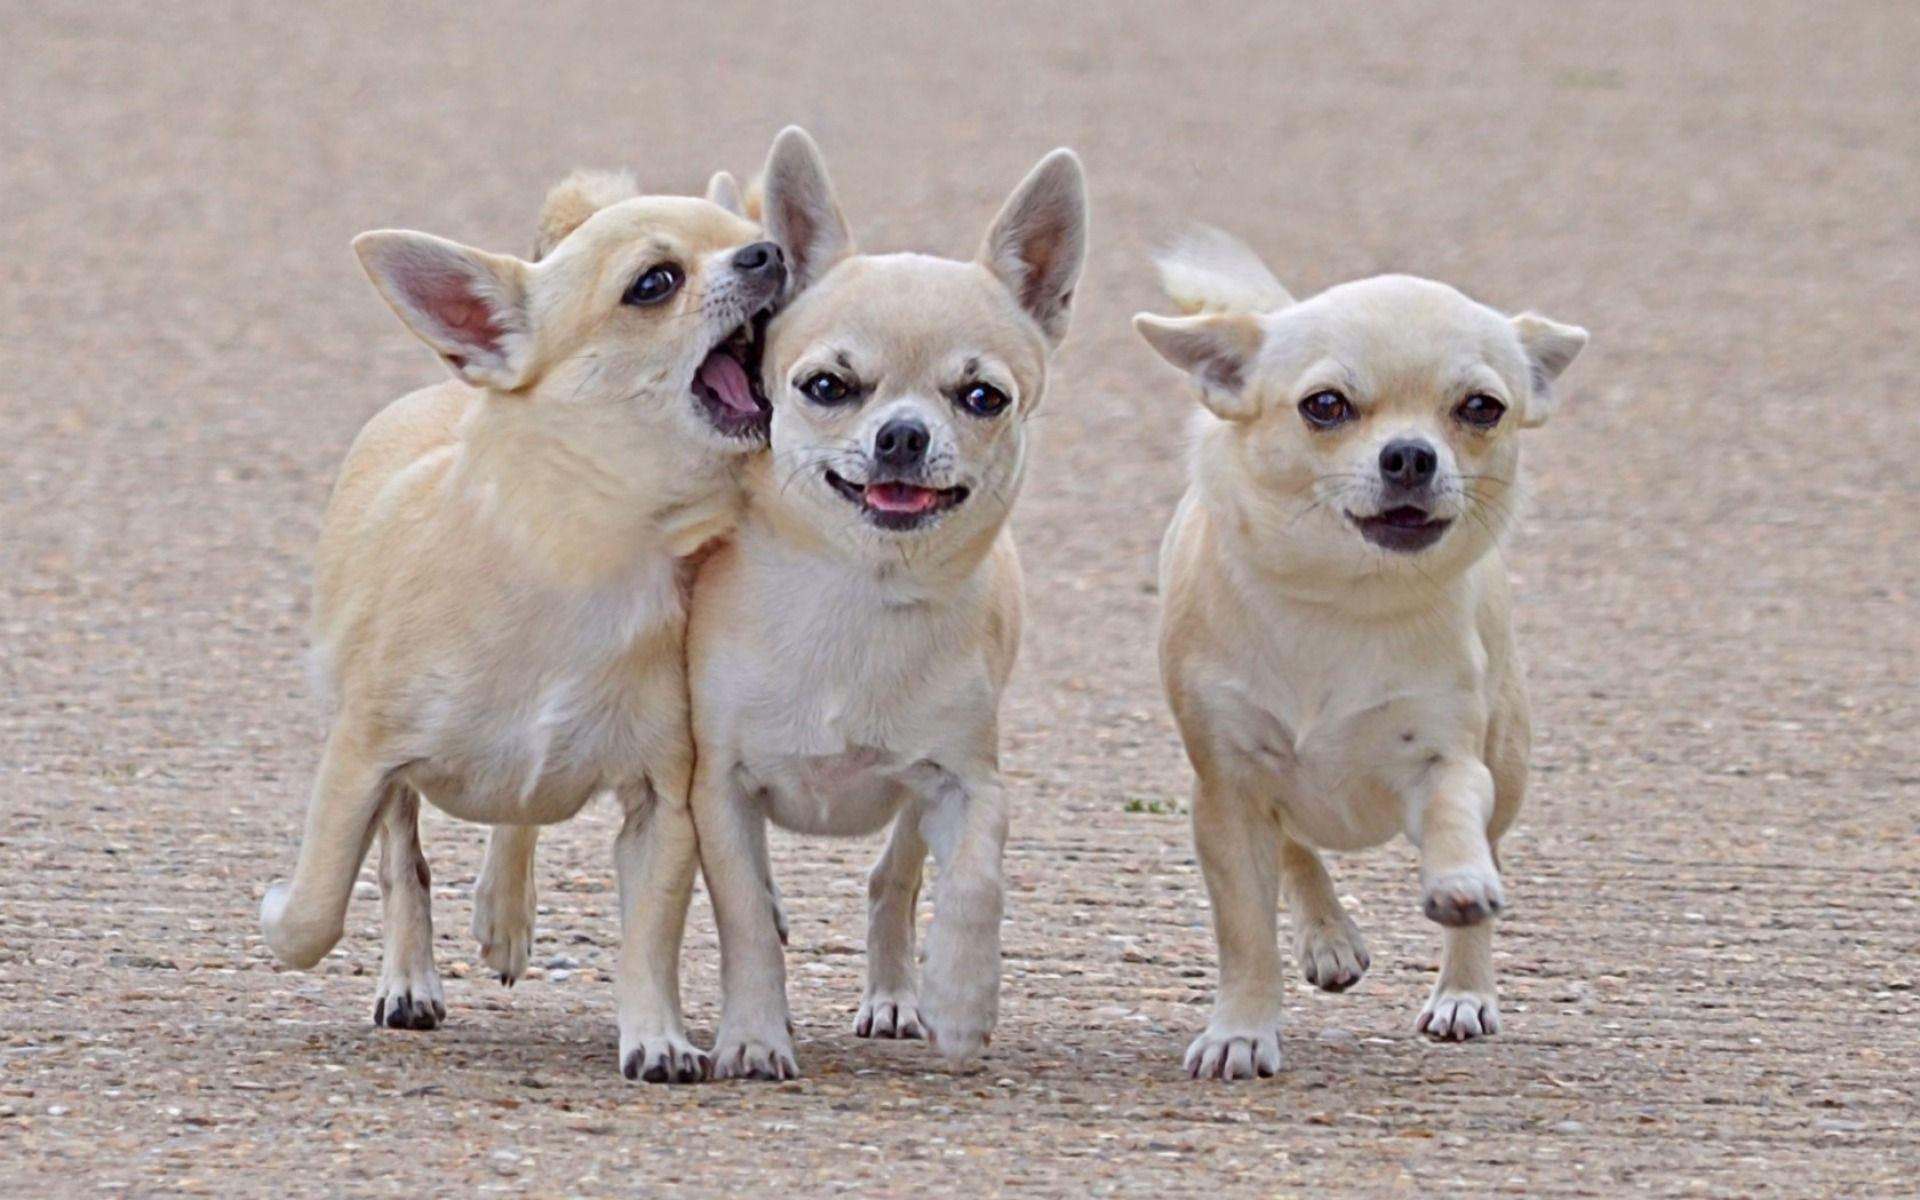 Best Chihuahua Canine Adorable Dog - 6f7ca711fec17d3395f98d74be723de6  Graphic_584852  .jpg